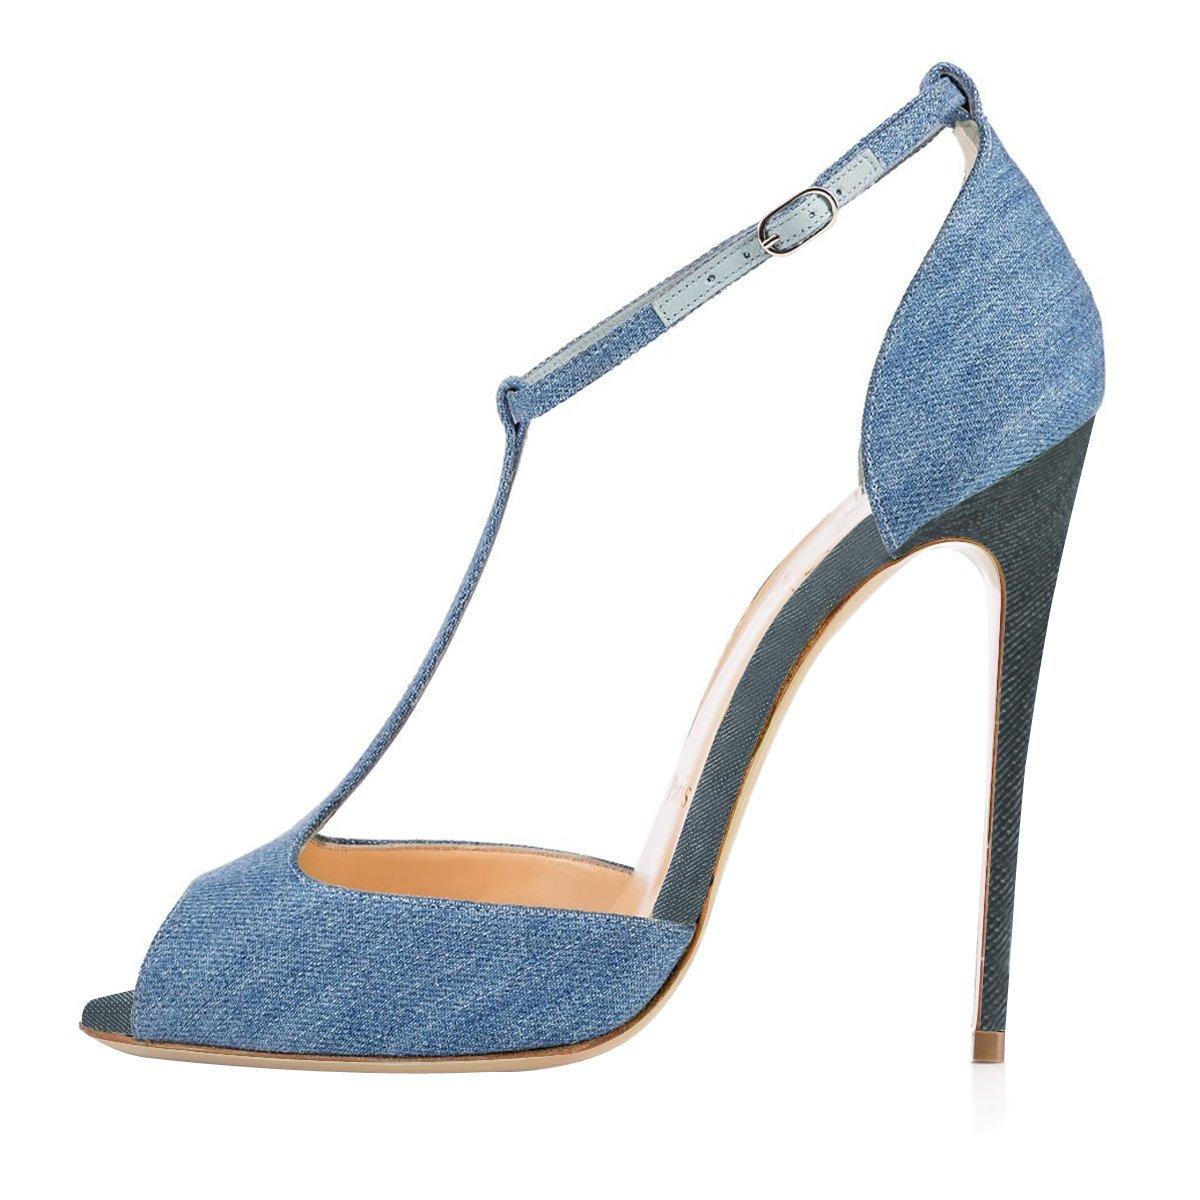 4c099afda26fdd Onlymaker Damen Sandalen High Heels Stiletto mit Fesselriemen T-Spangen  Peep Toe Sommer Schuhe Denim Blau EU45  Amazon.de  Schuhe   Handtaschen